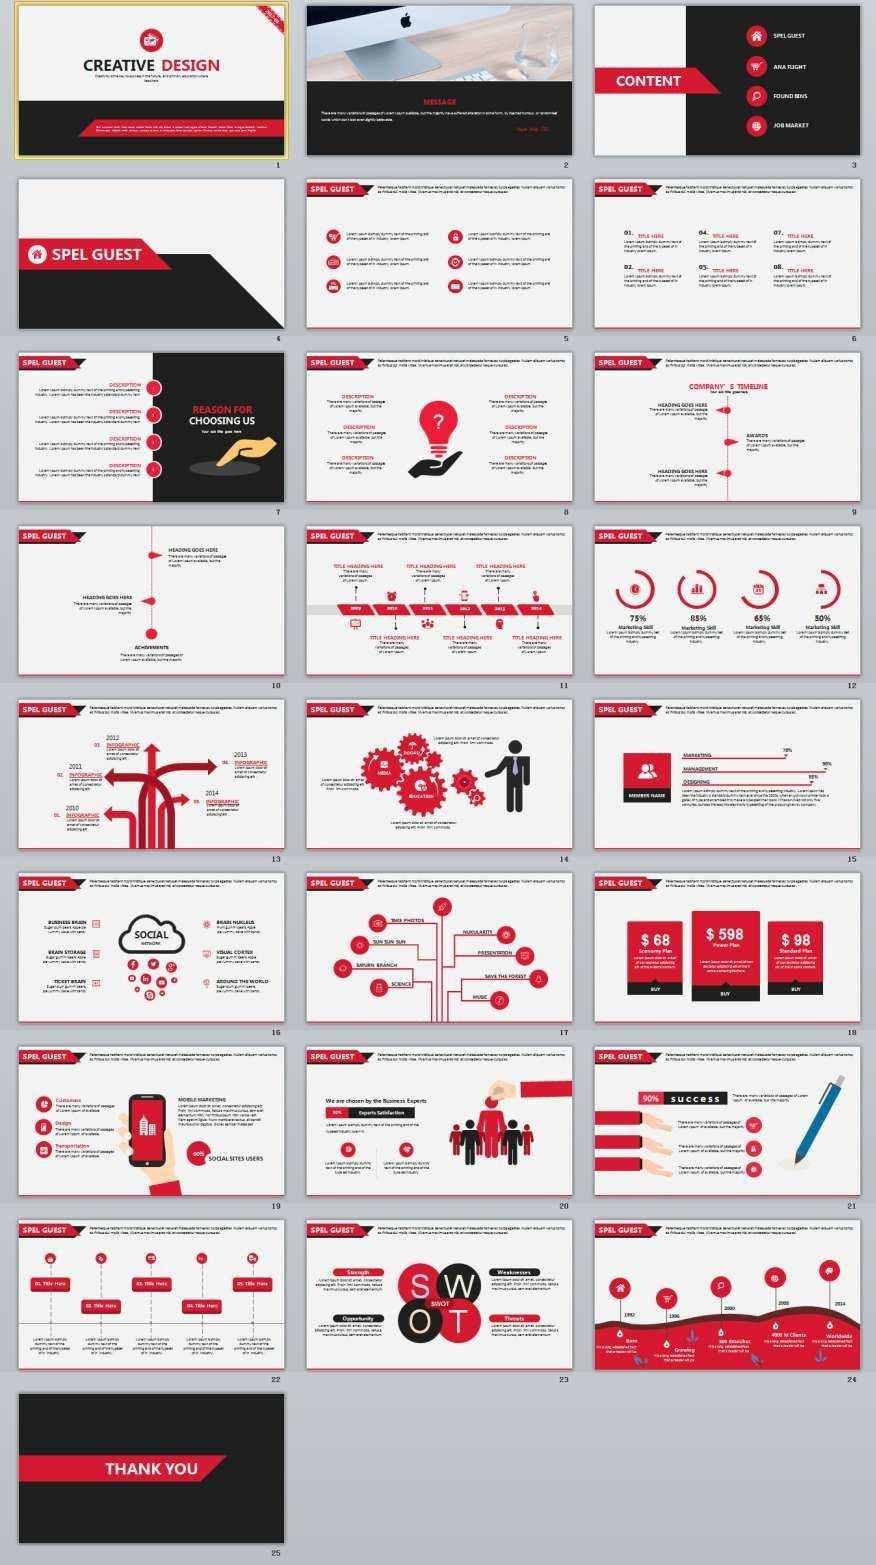 25 Creative Design Powerpoint Template Powerpoint Layout De